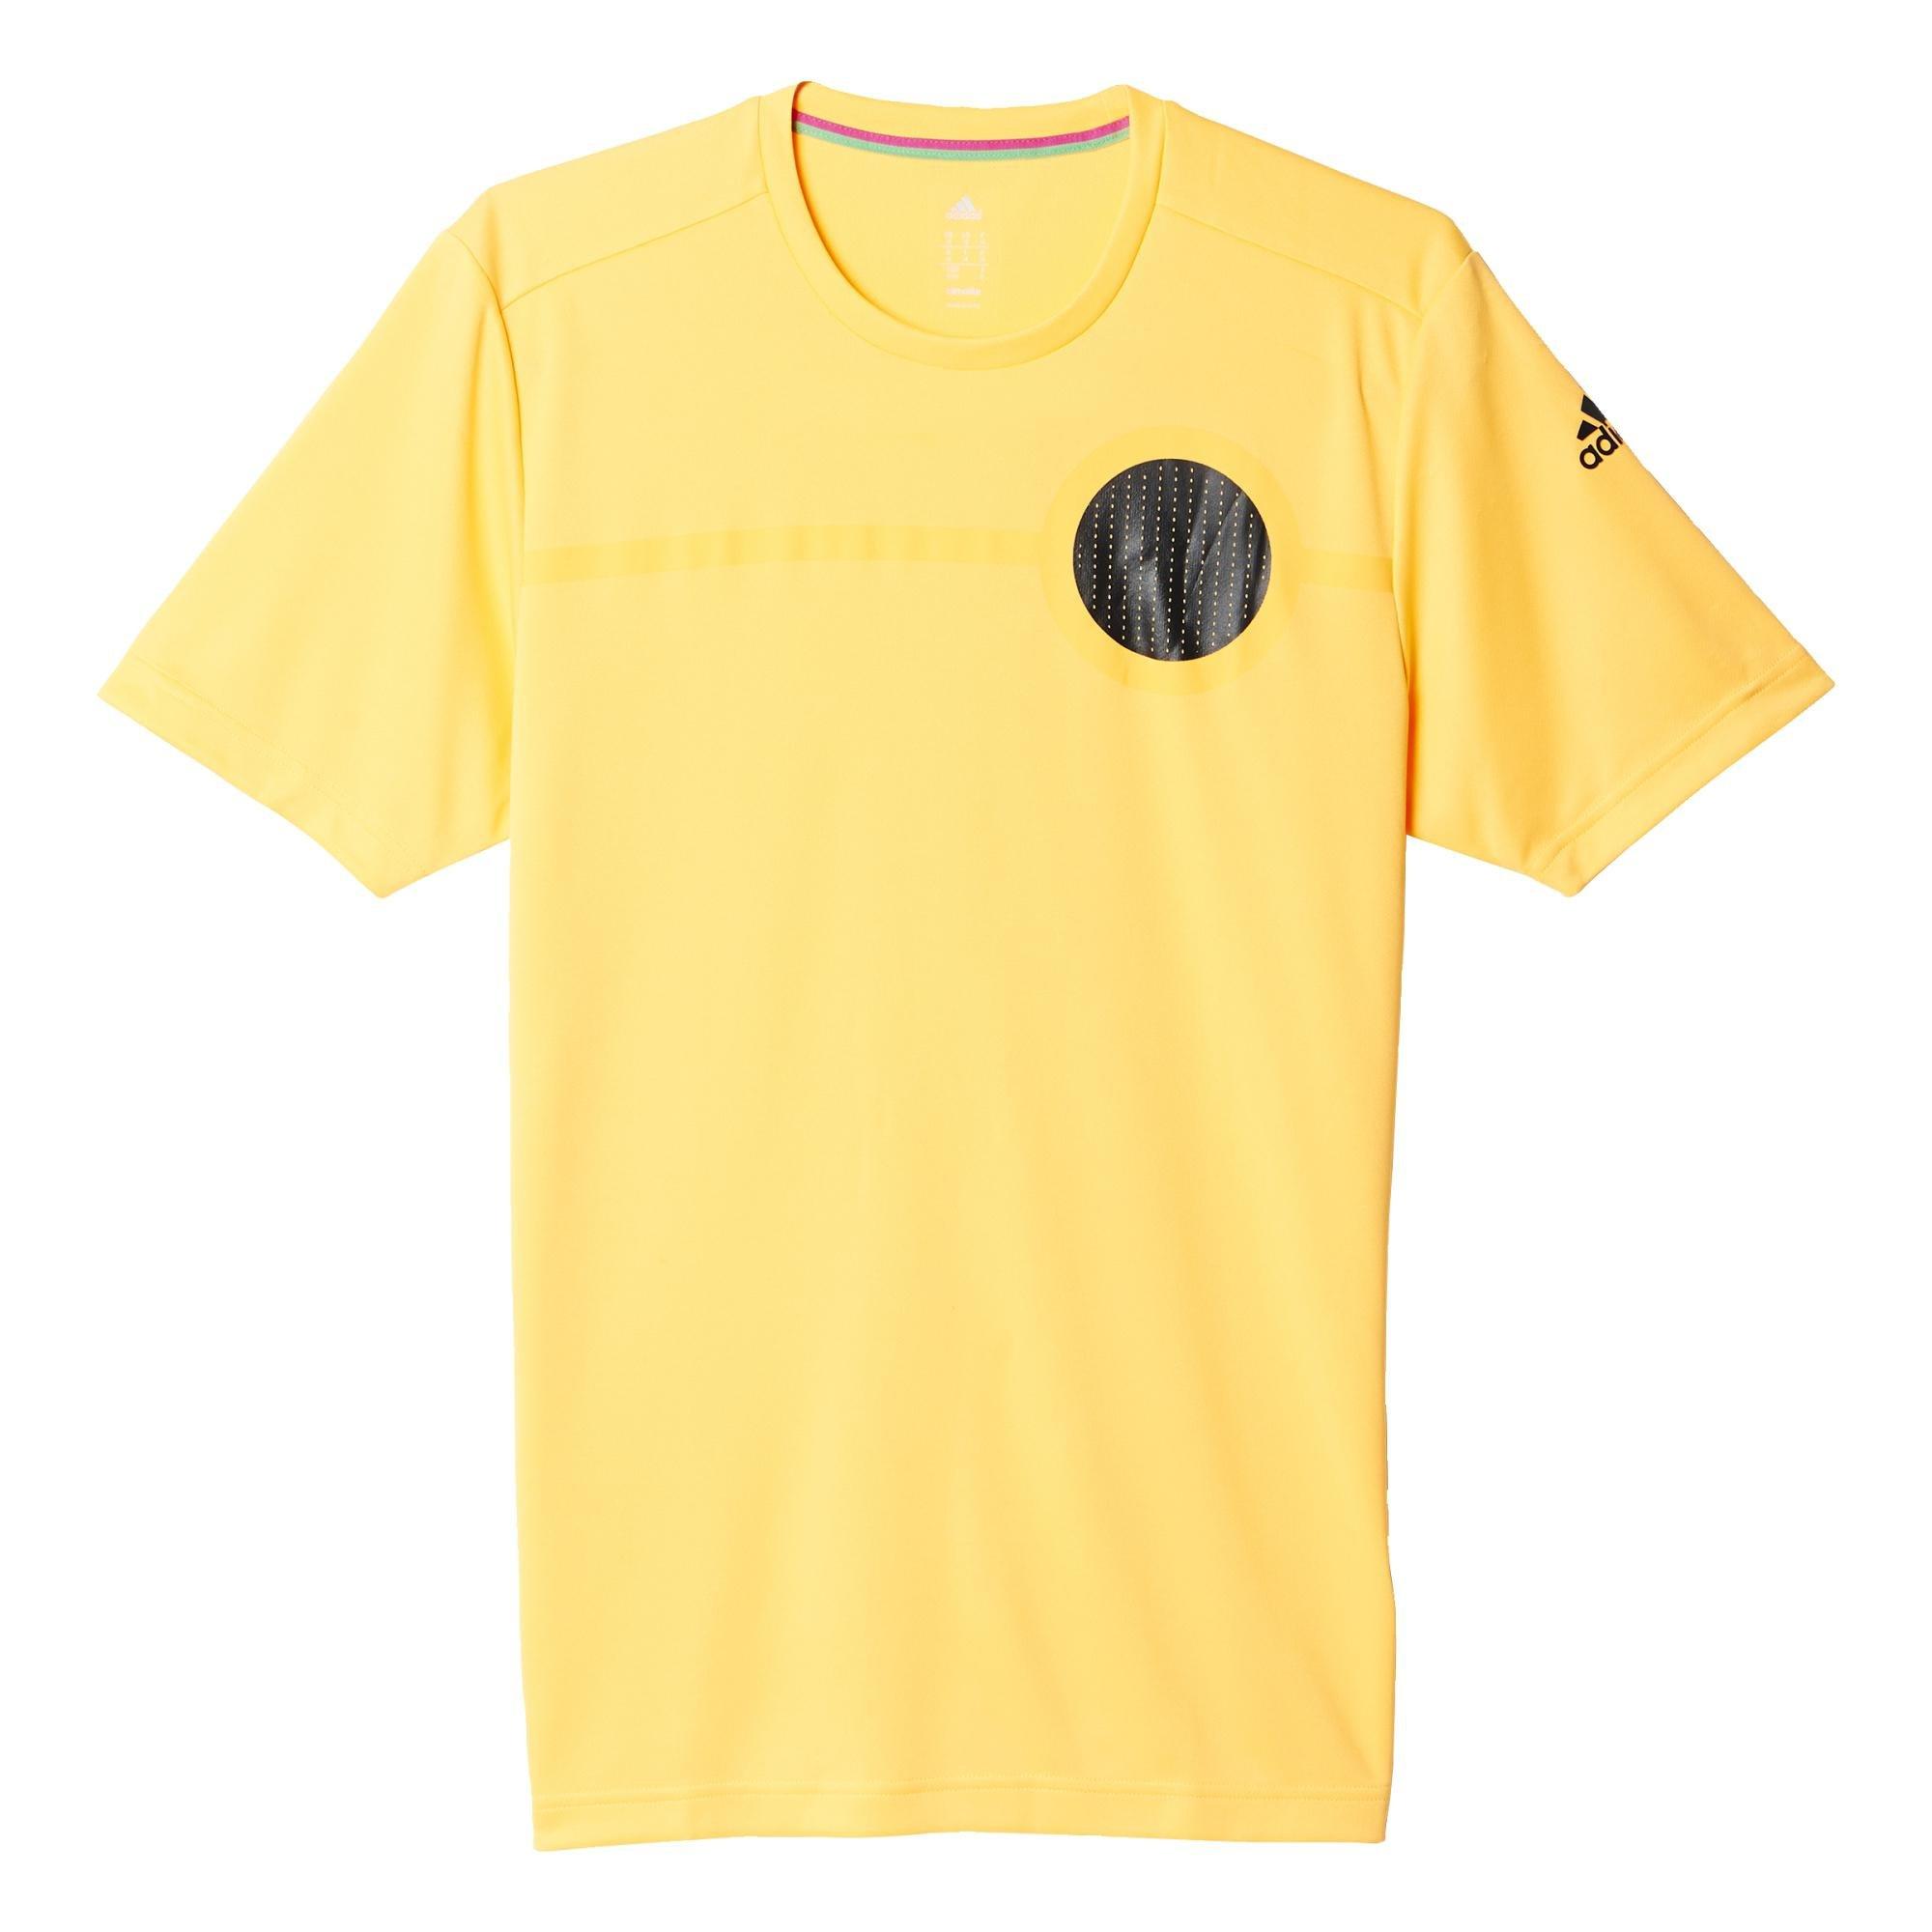 Adidas Ufb Clmlt Tee Maglia per Uomo, Oro (Dorsol), S